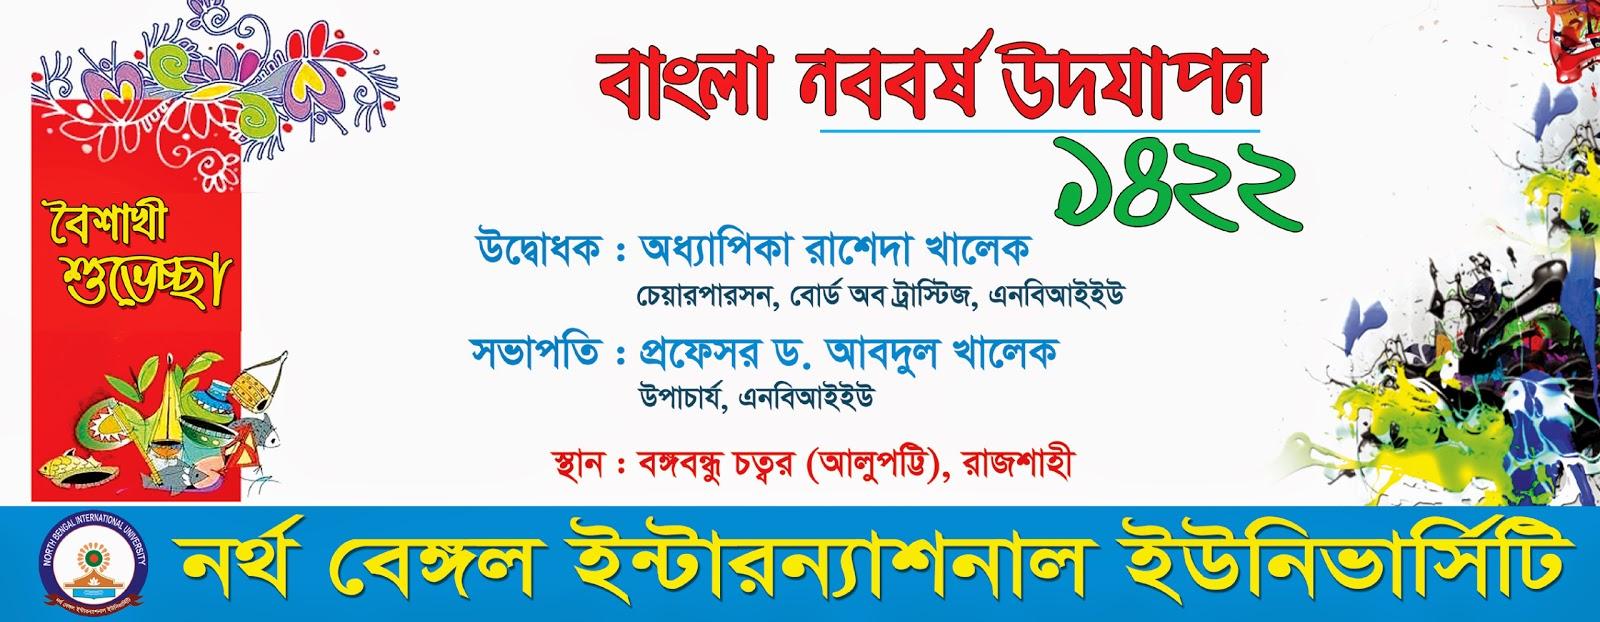 ... International University | North Bengal International University